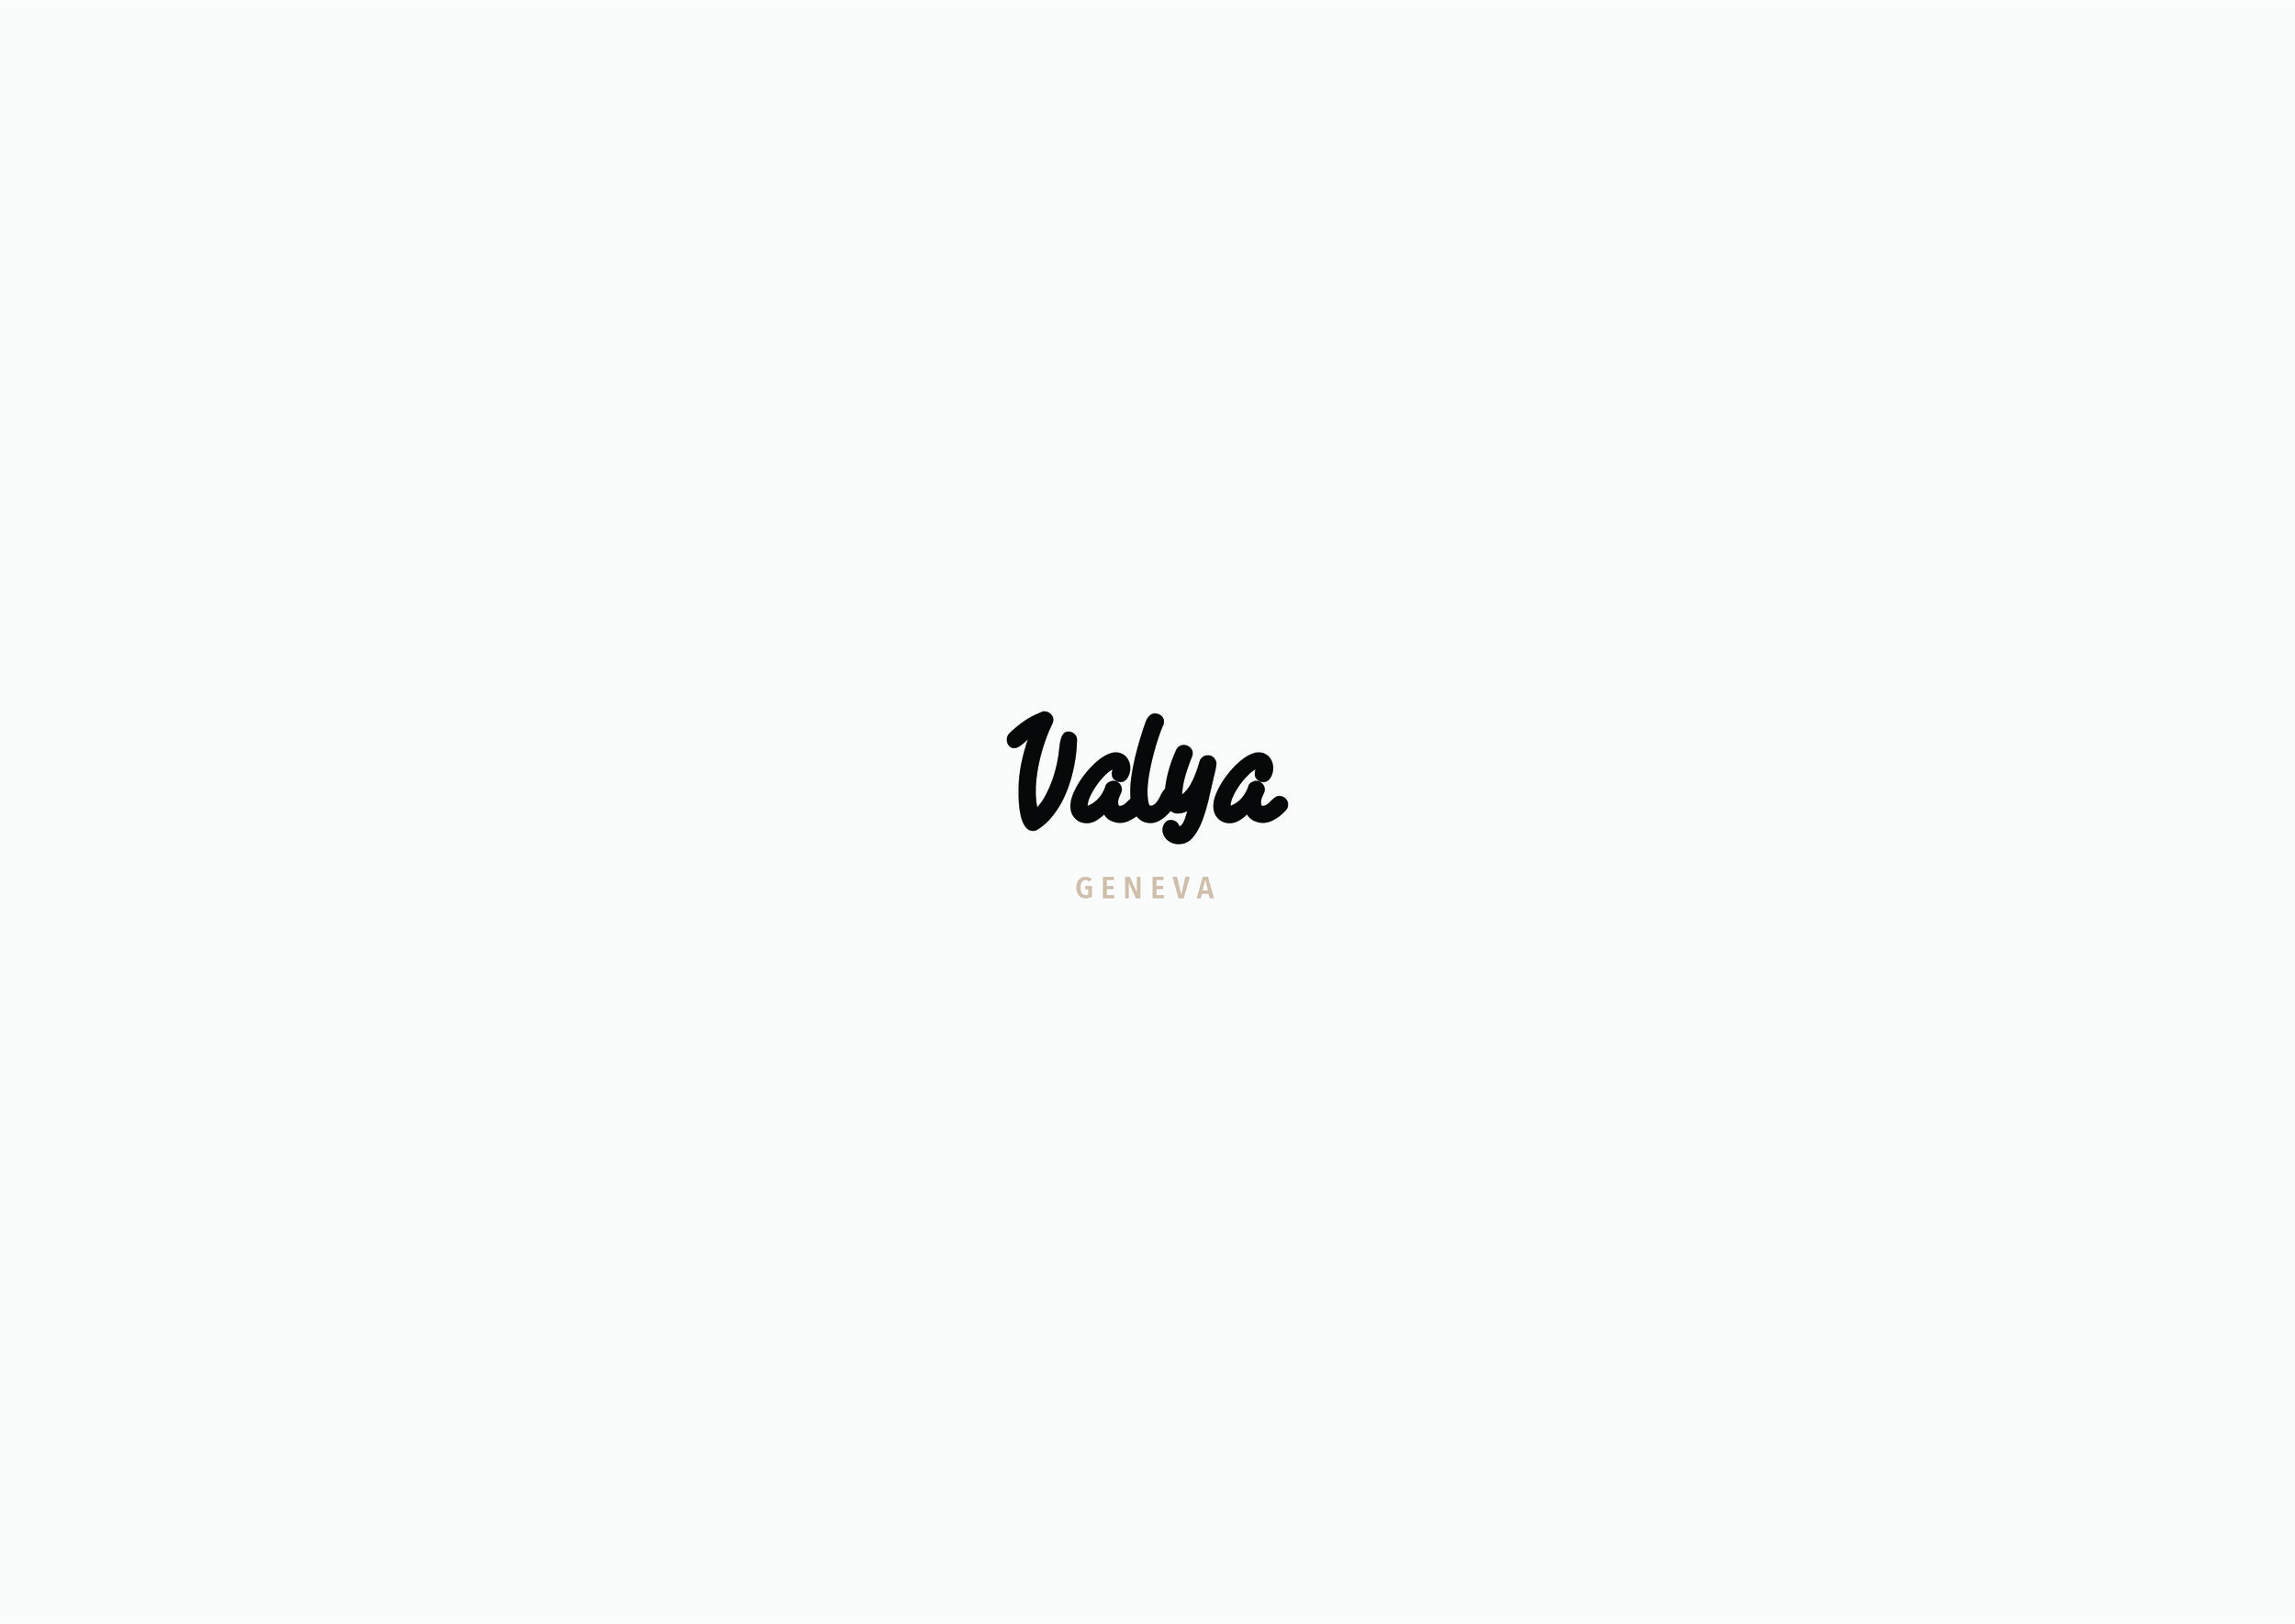 WhyTheG_logos2016-06.jpg